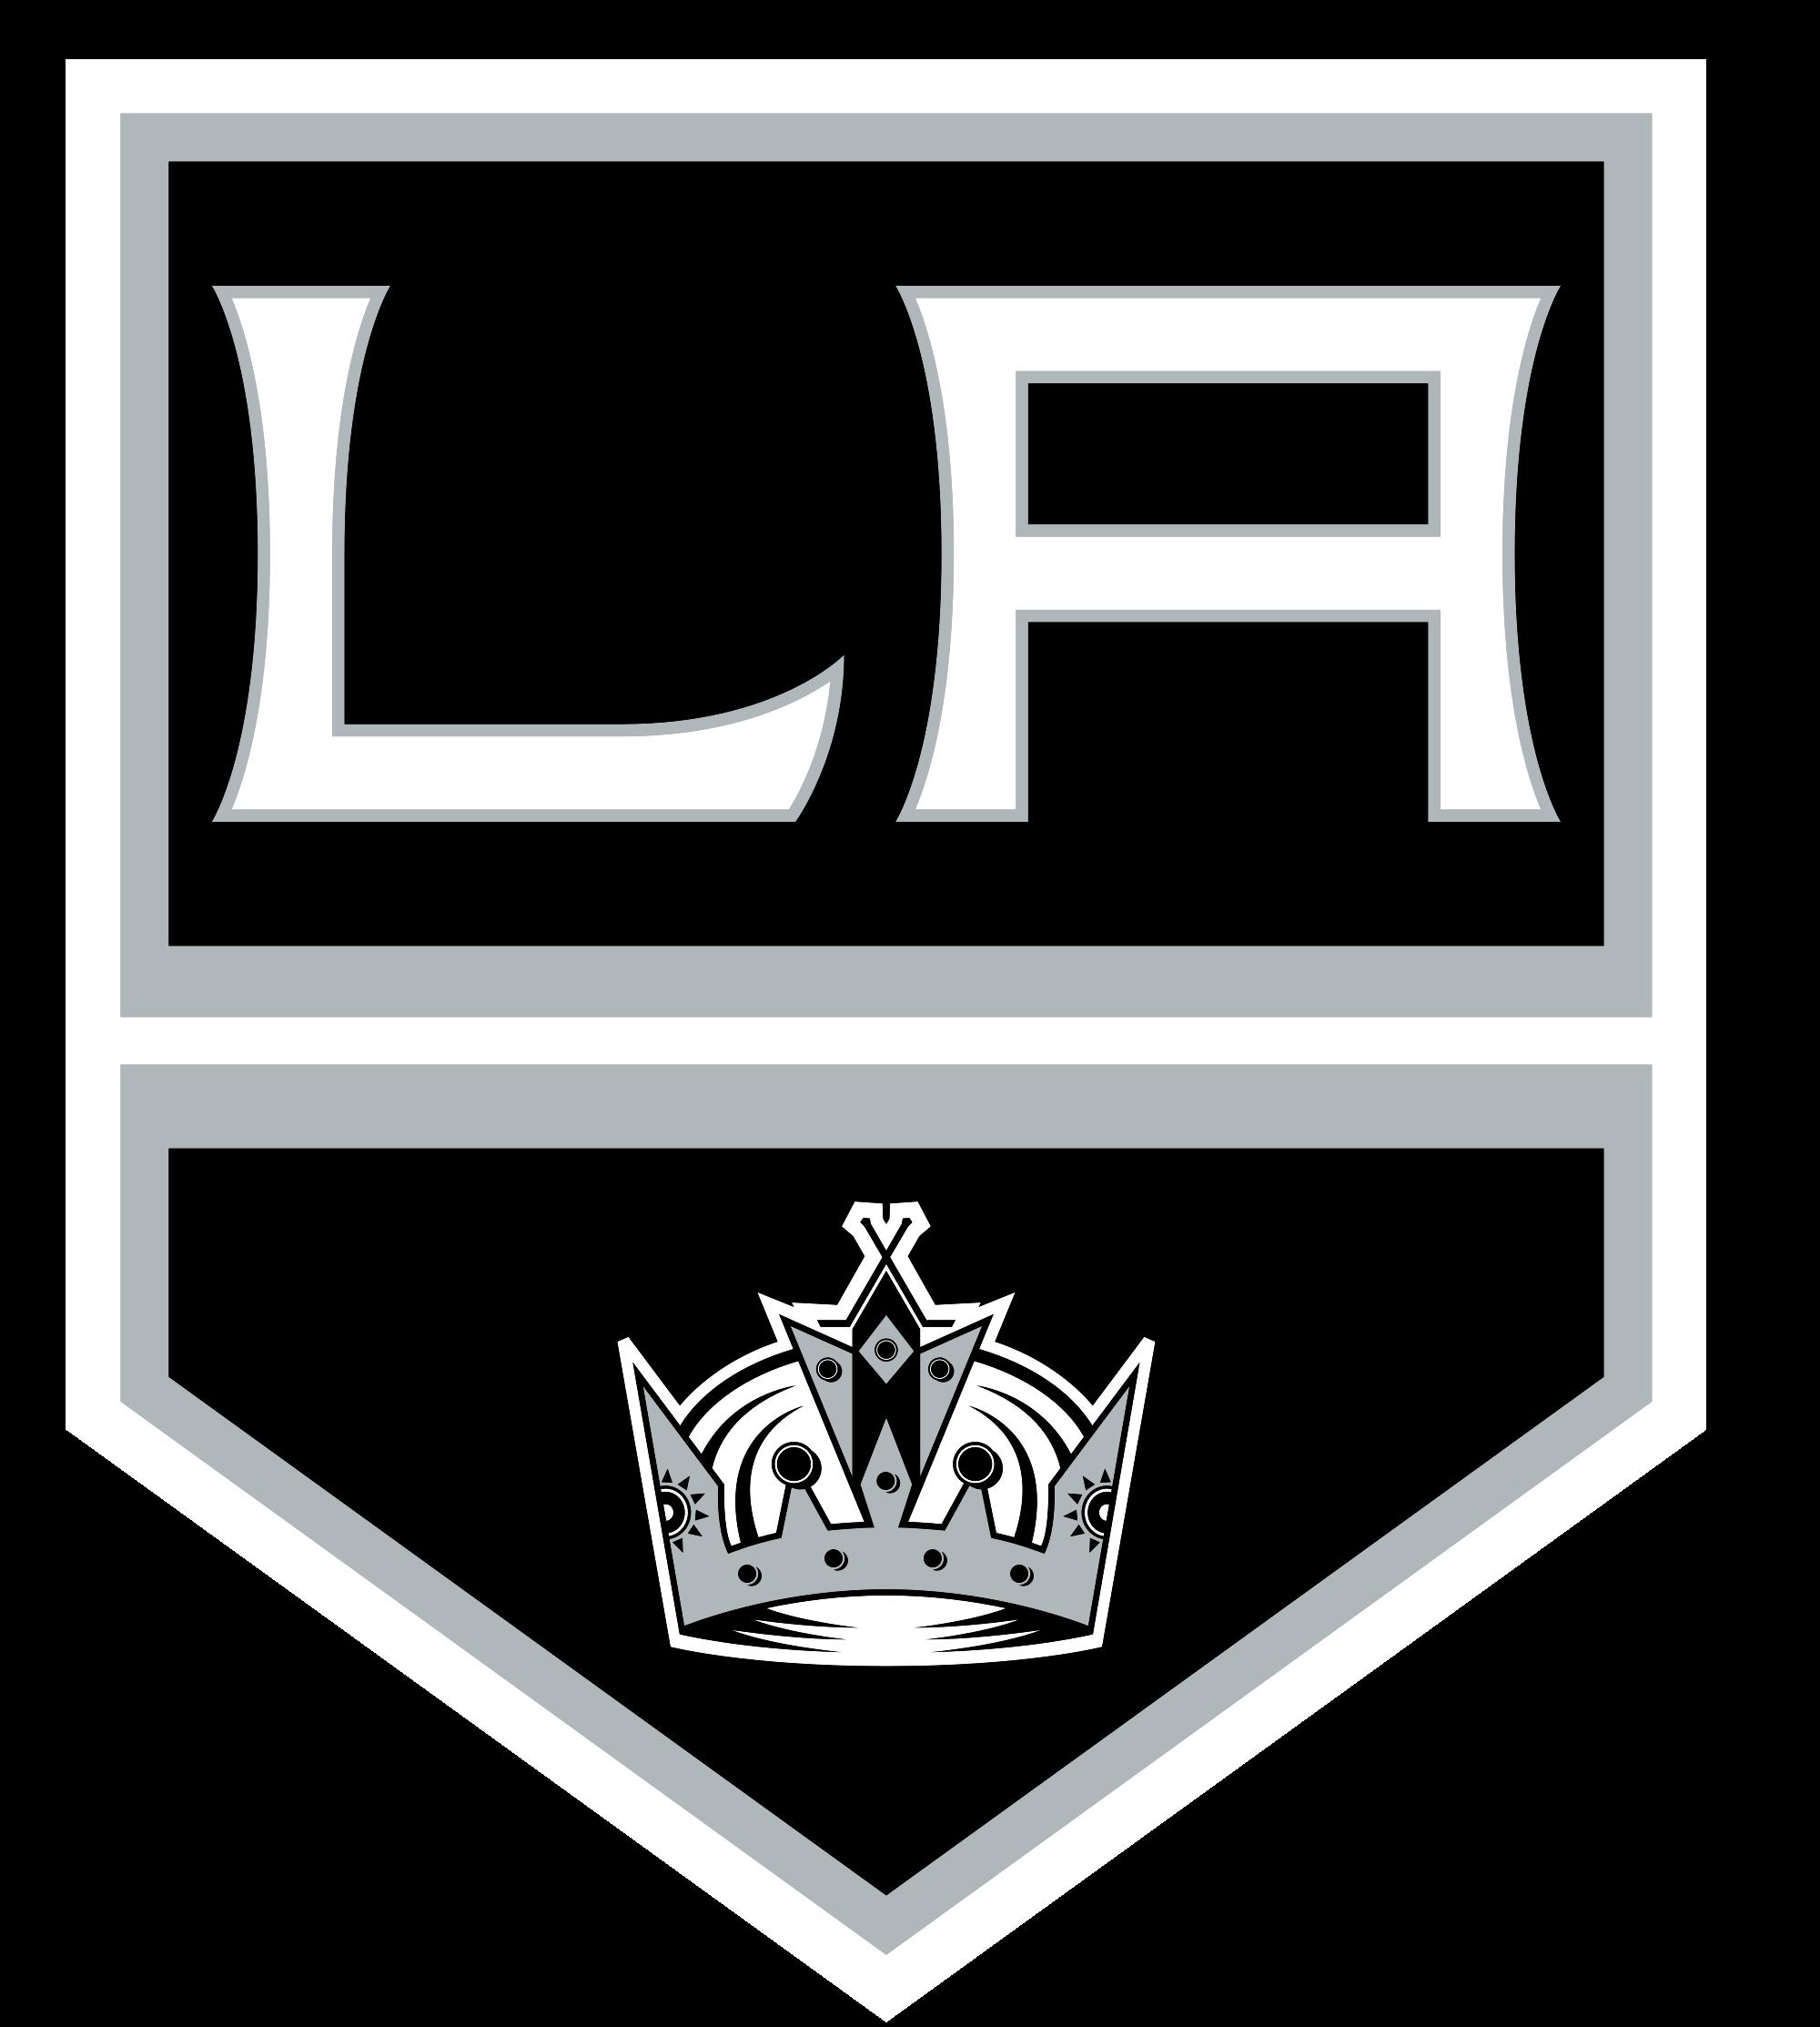 La Kings Logo HD Wallpaper 2000x2227